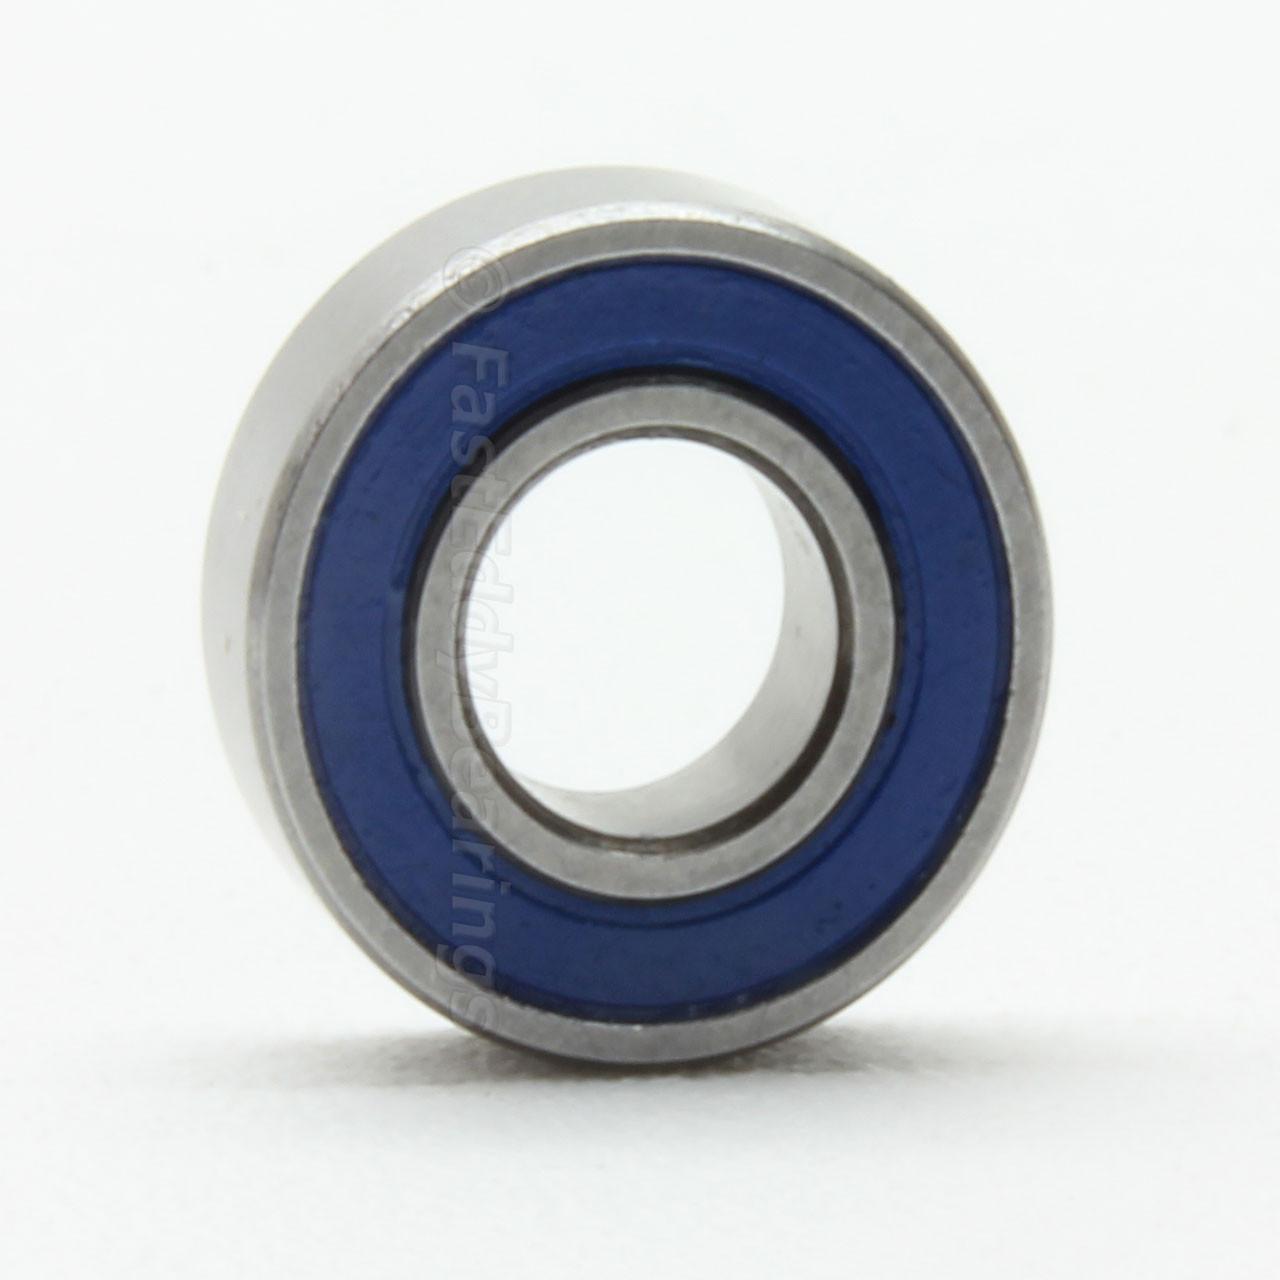 5x11x4 mm Yellow Rubber Sealed Ball Bearing Bearings 5*11*4 20pcs MR115-2RS